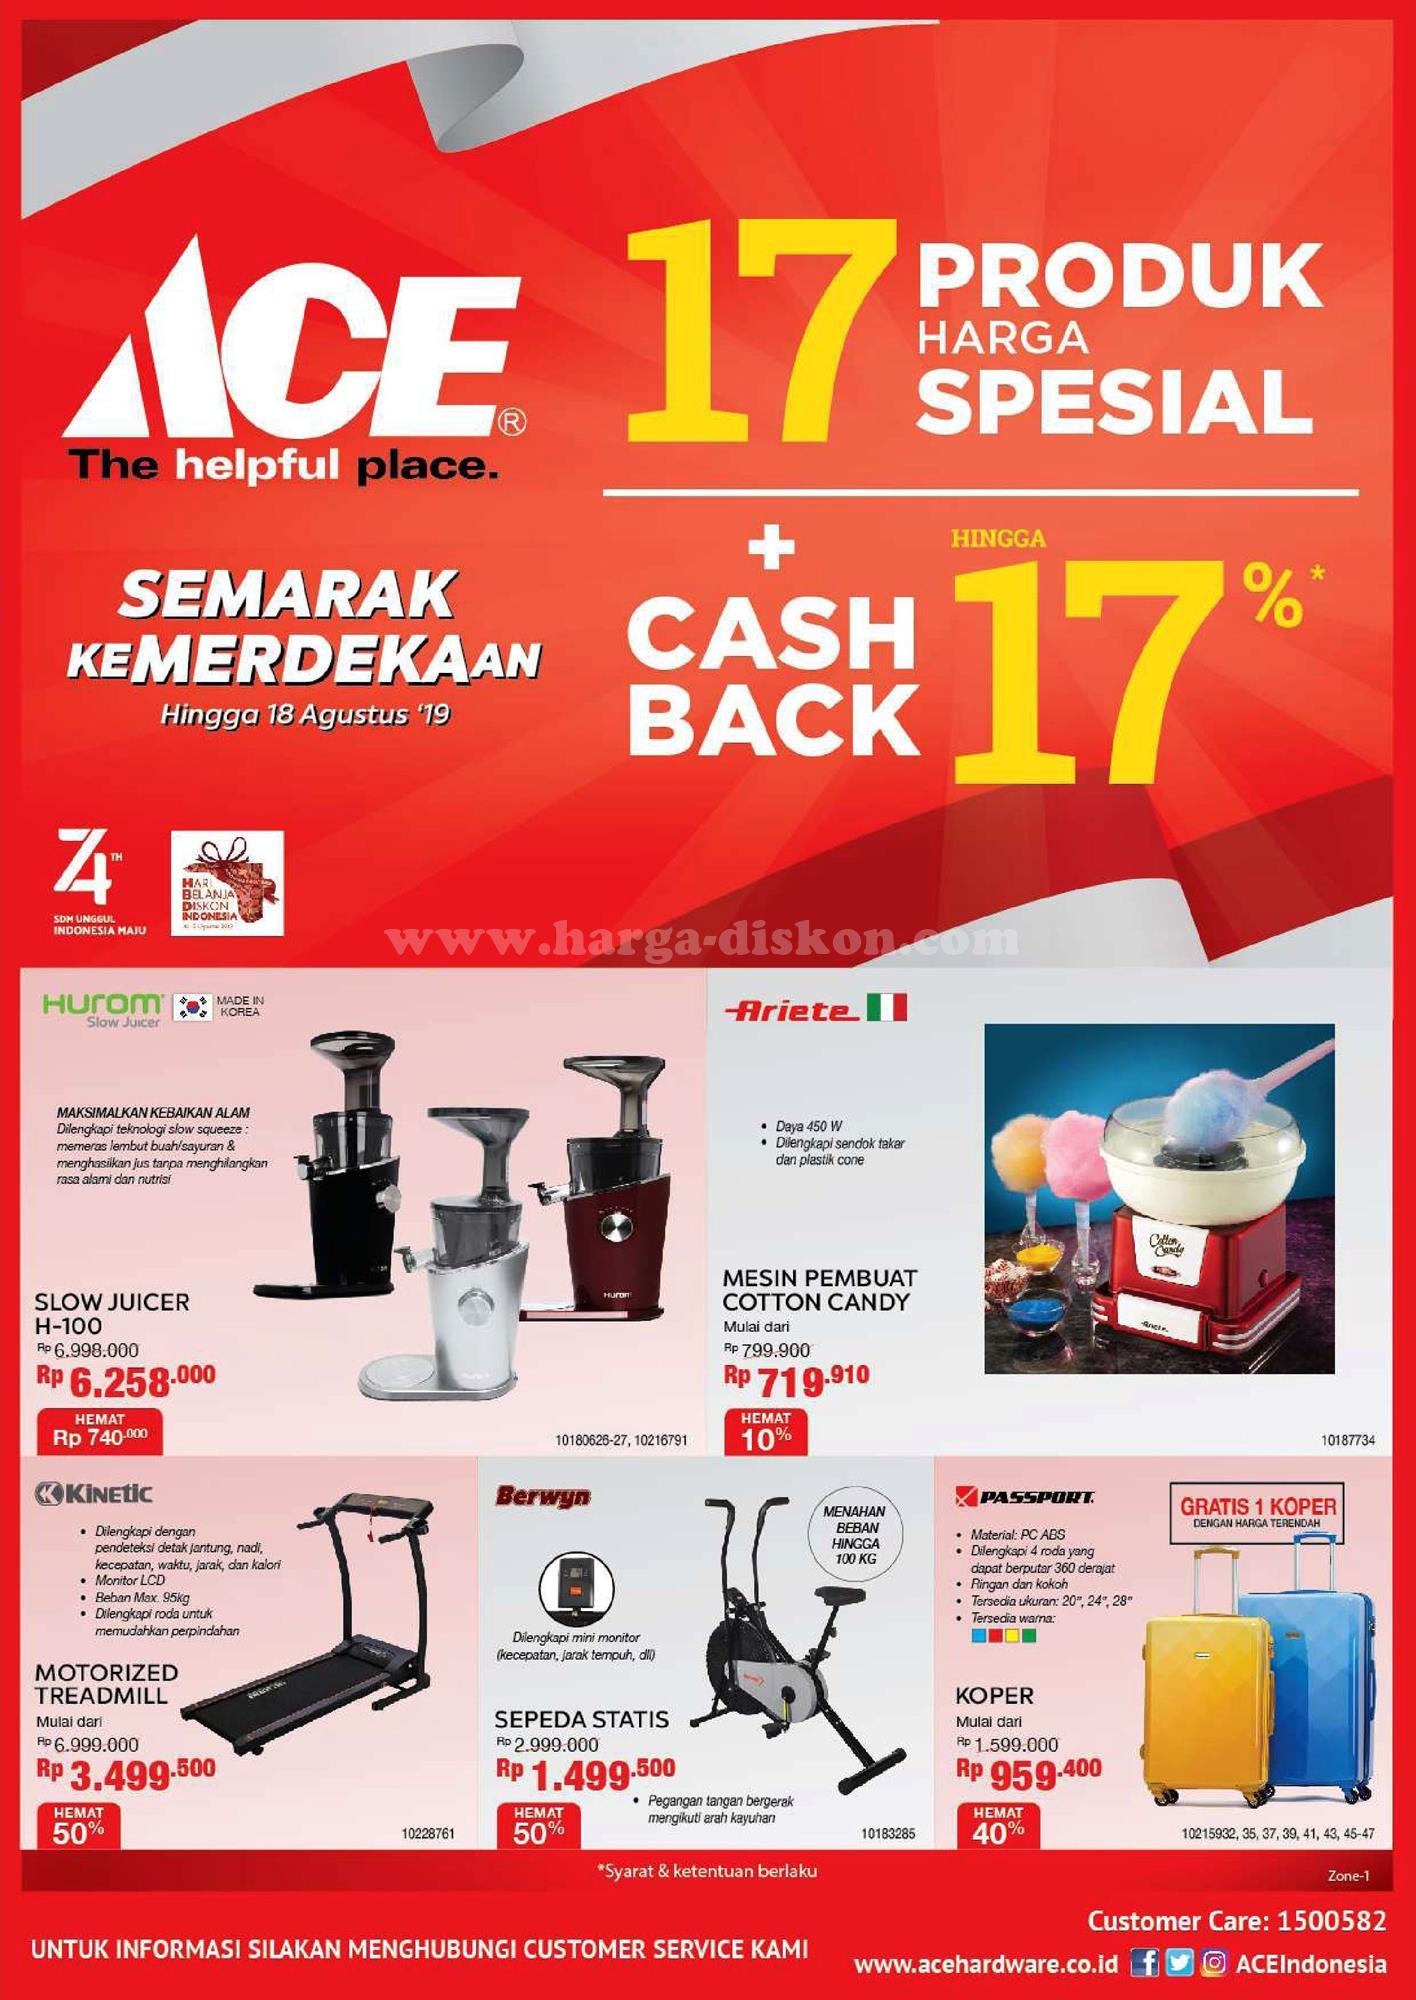 Promo Ace Hardware Cashback Hingga 17 Atau Harga Spesial 17 Produk Periode 16 18 Agustus 2019 Harga Diskon